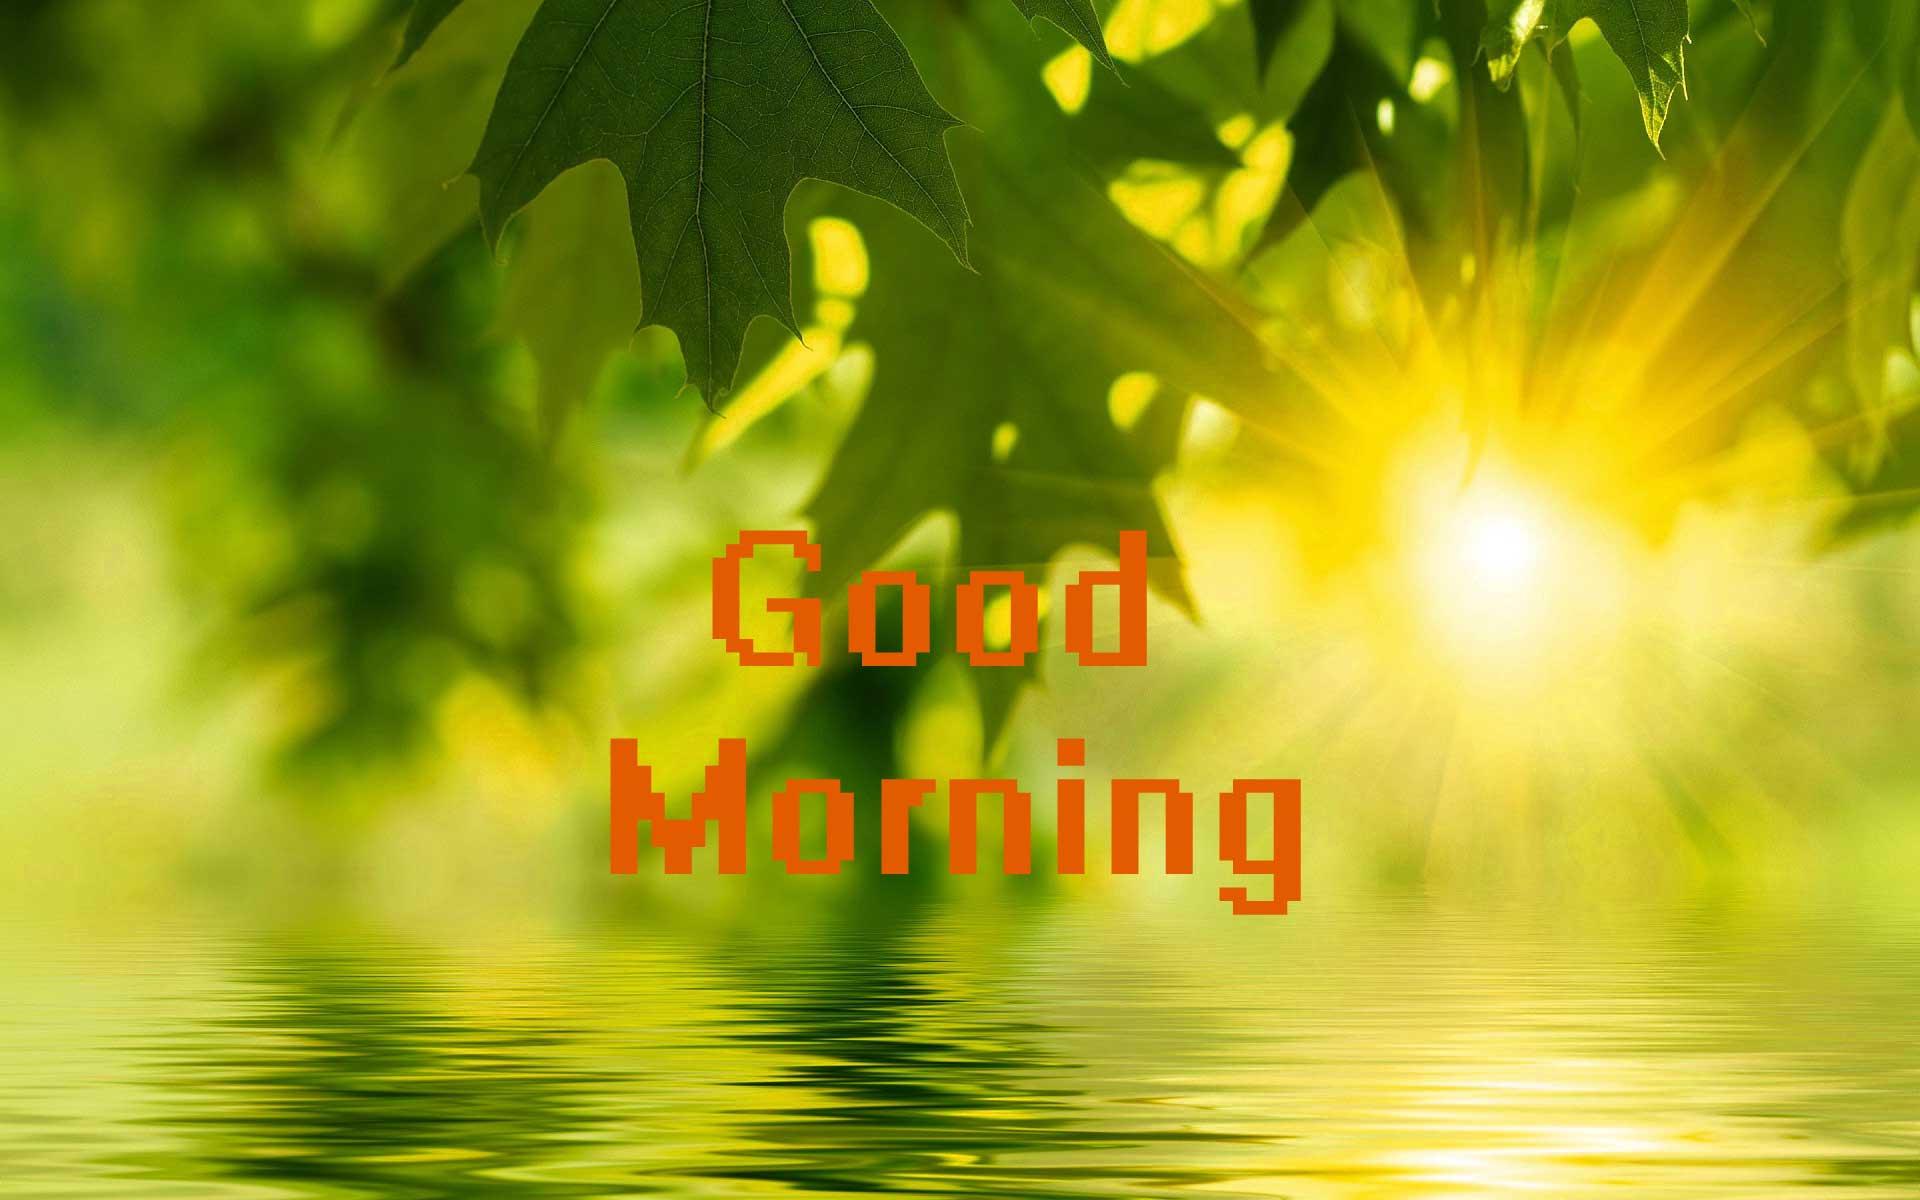 Good Morning Sunshine Nature Photo - Whatsapp Good Morning Nature , HD Wallpaper & Backgrounds